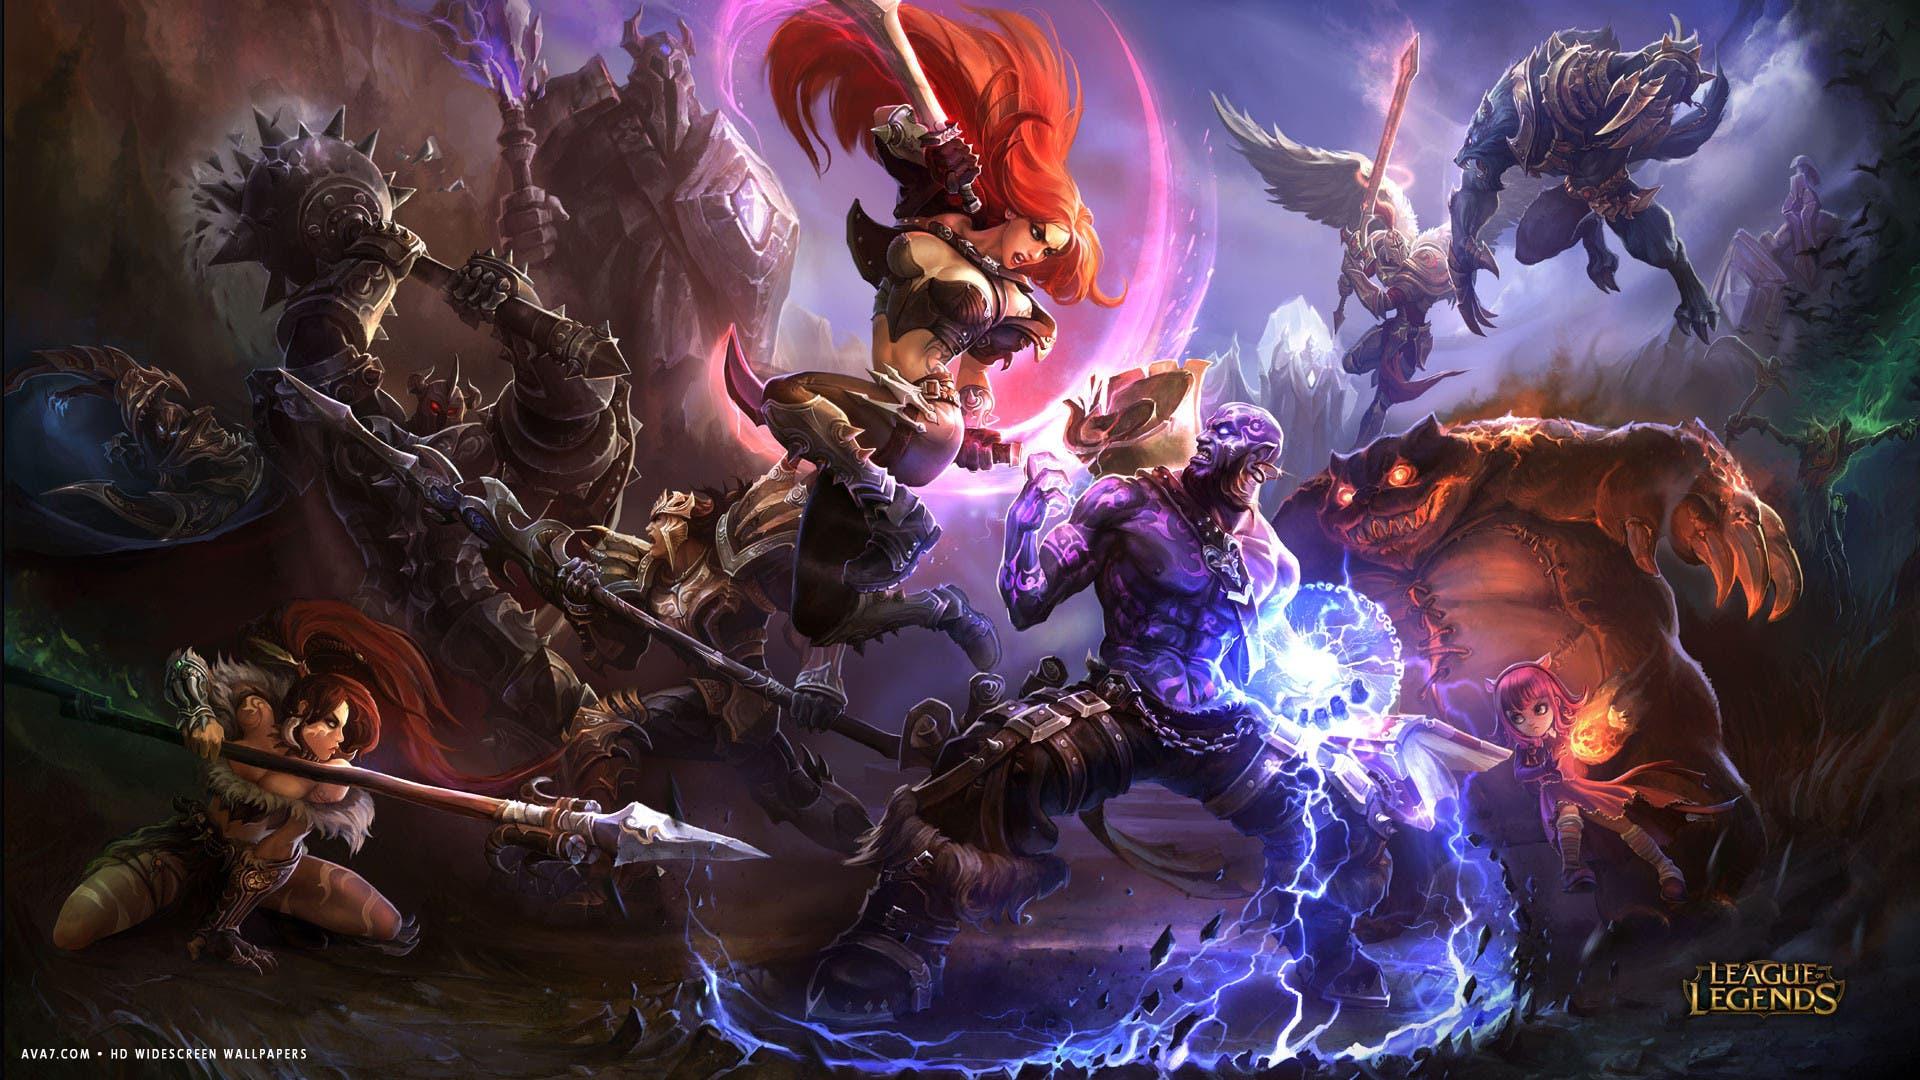 league-of-legends-game-lol-katarina-versus-ryze-magic-battle